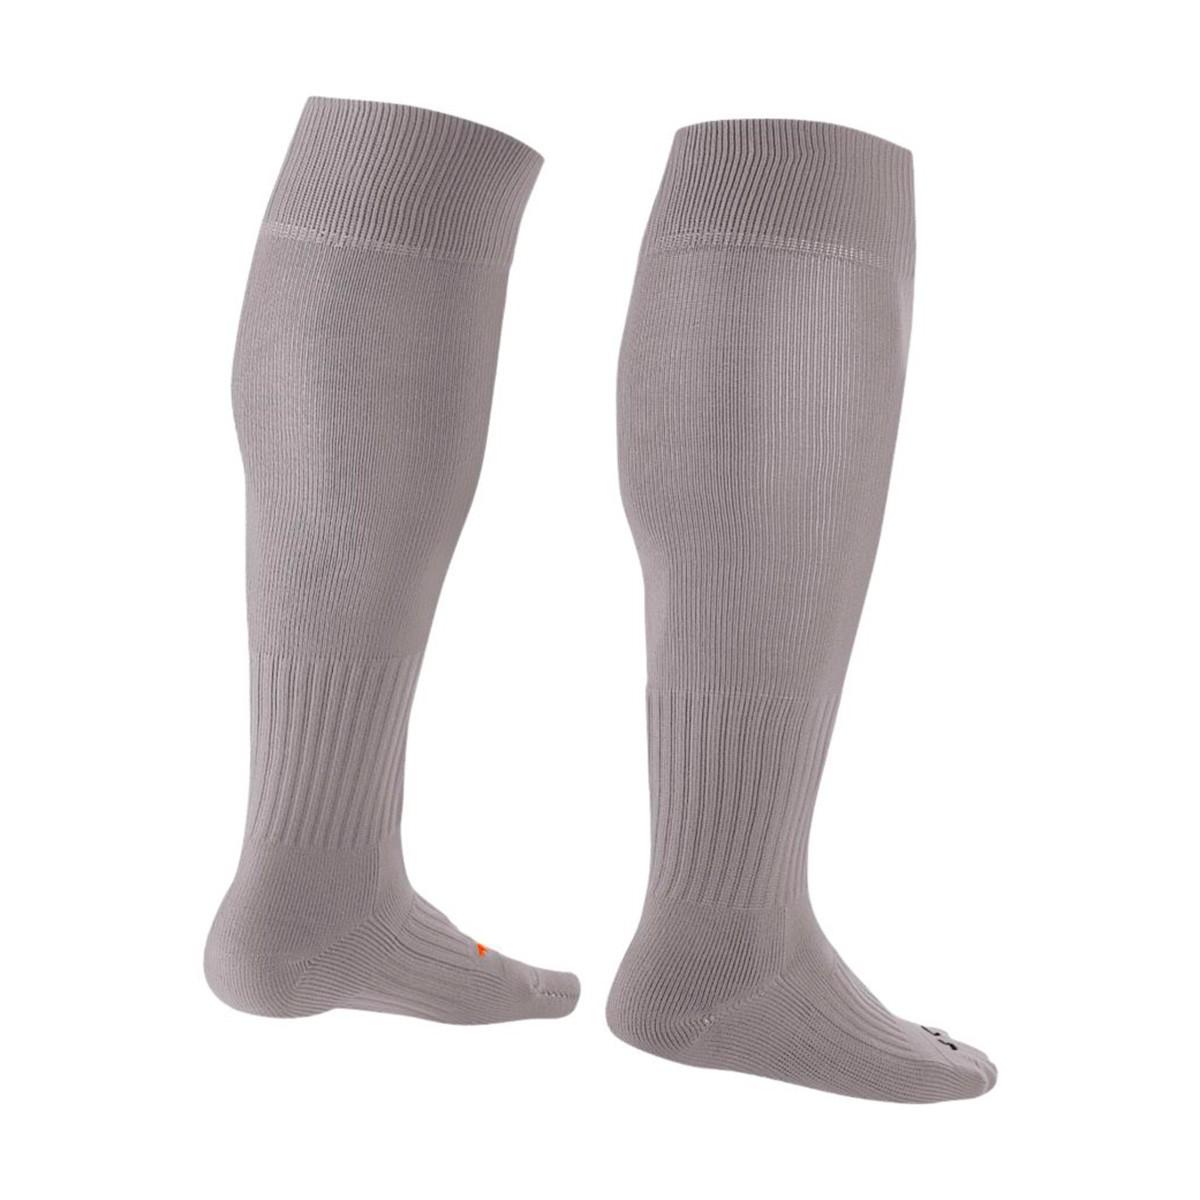 b73c1318c Football Socks Nike Classic II Over-the-Calf Pewter grey - Tienda de fútbol  Fútbol Emotion